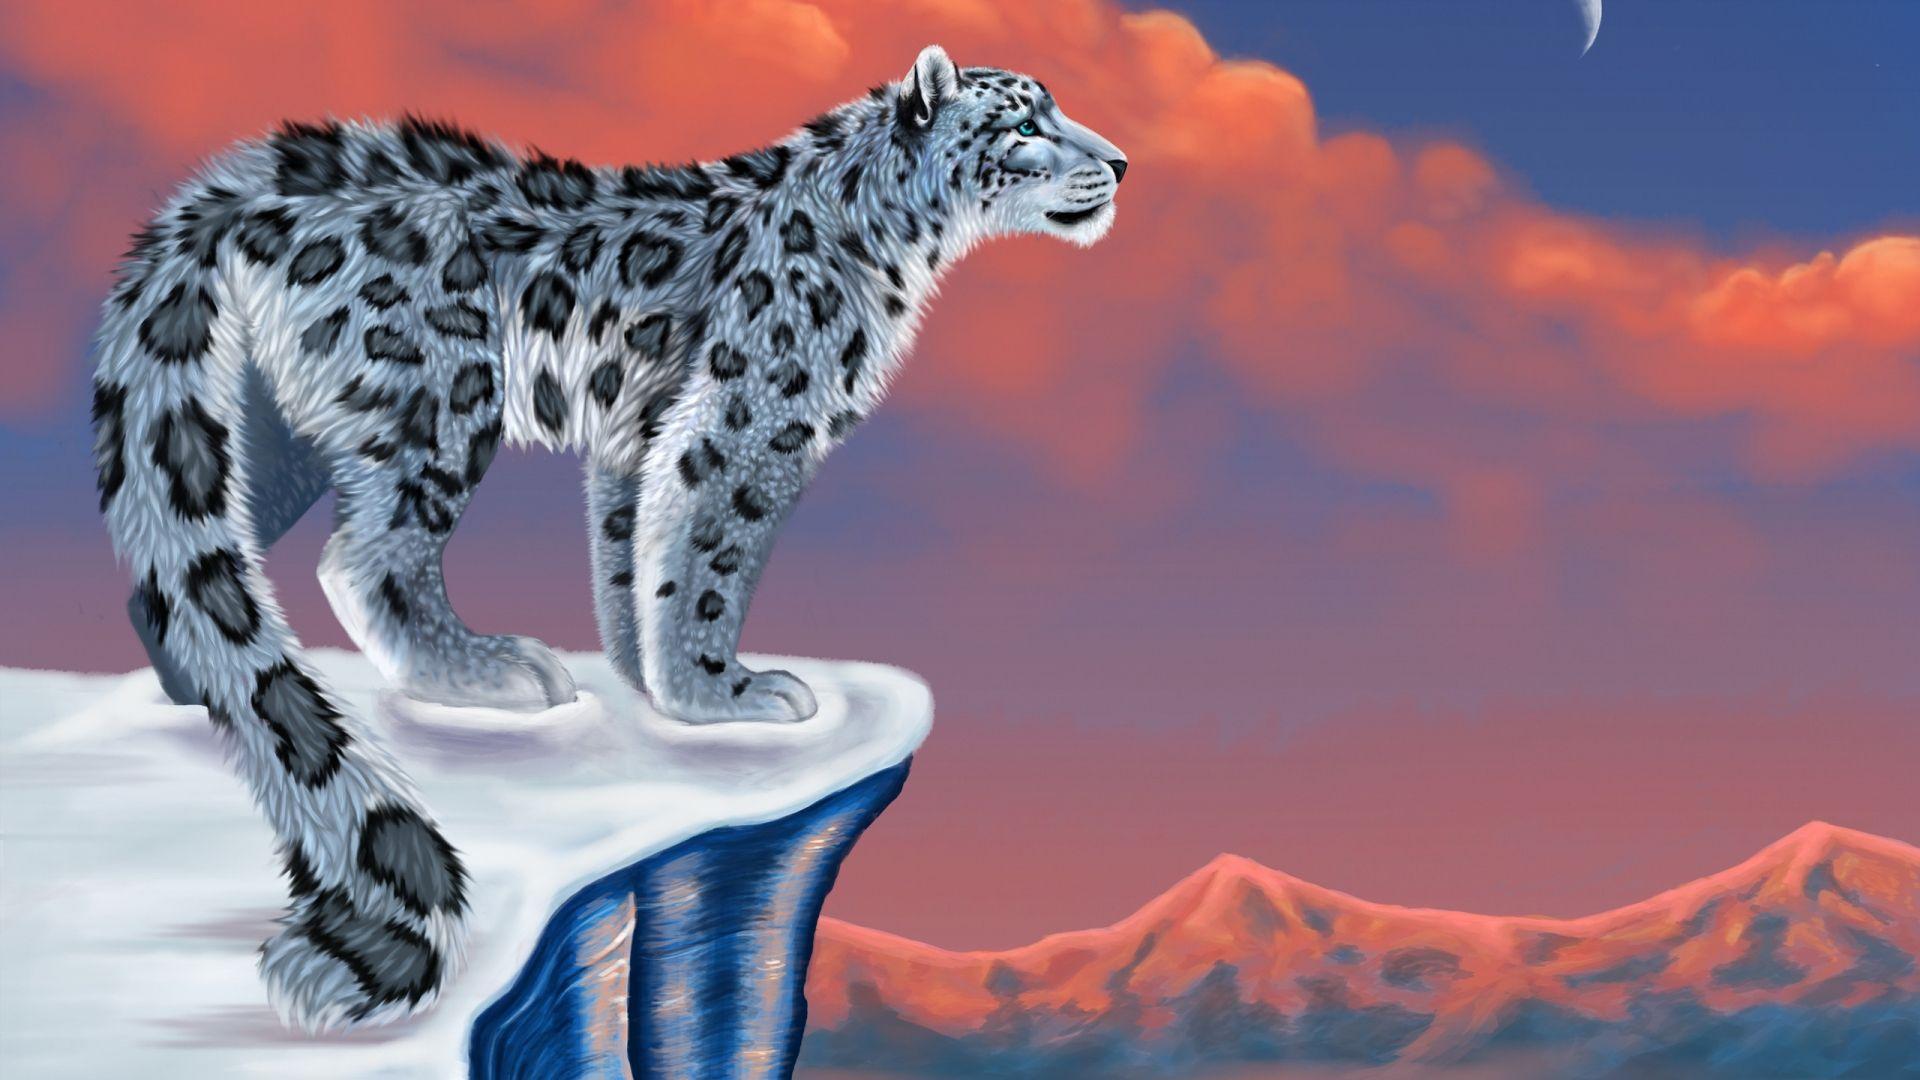 Hd White Tiger Wallpaper 3d Wallpapers Pinterest Animals